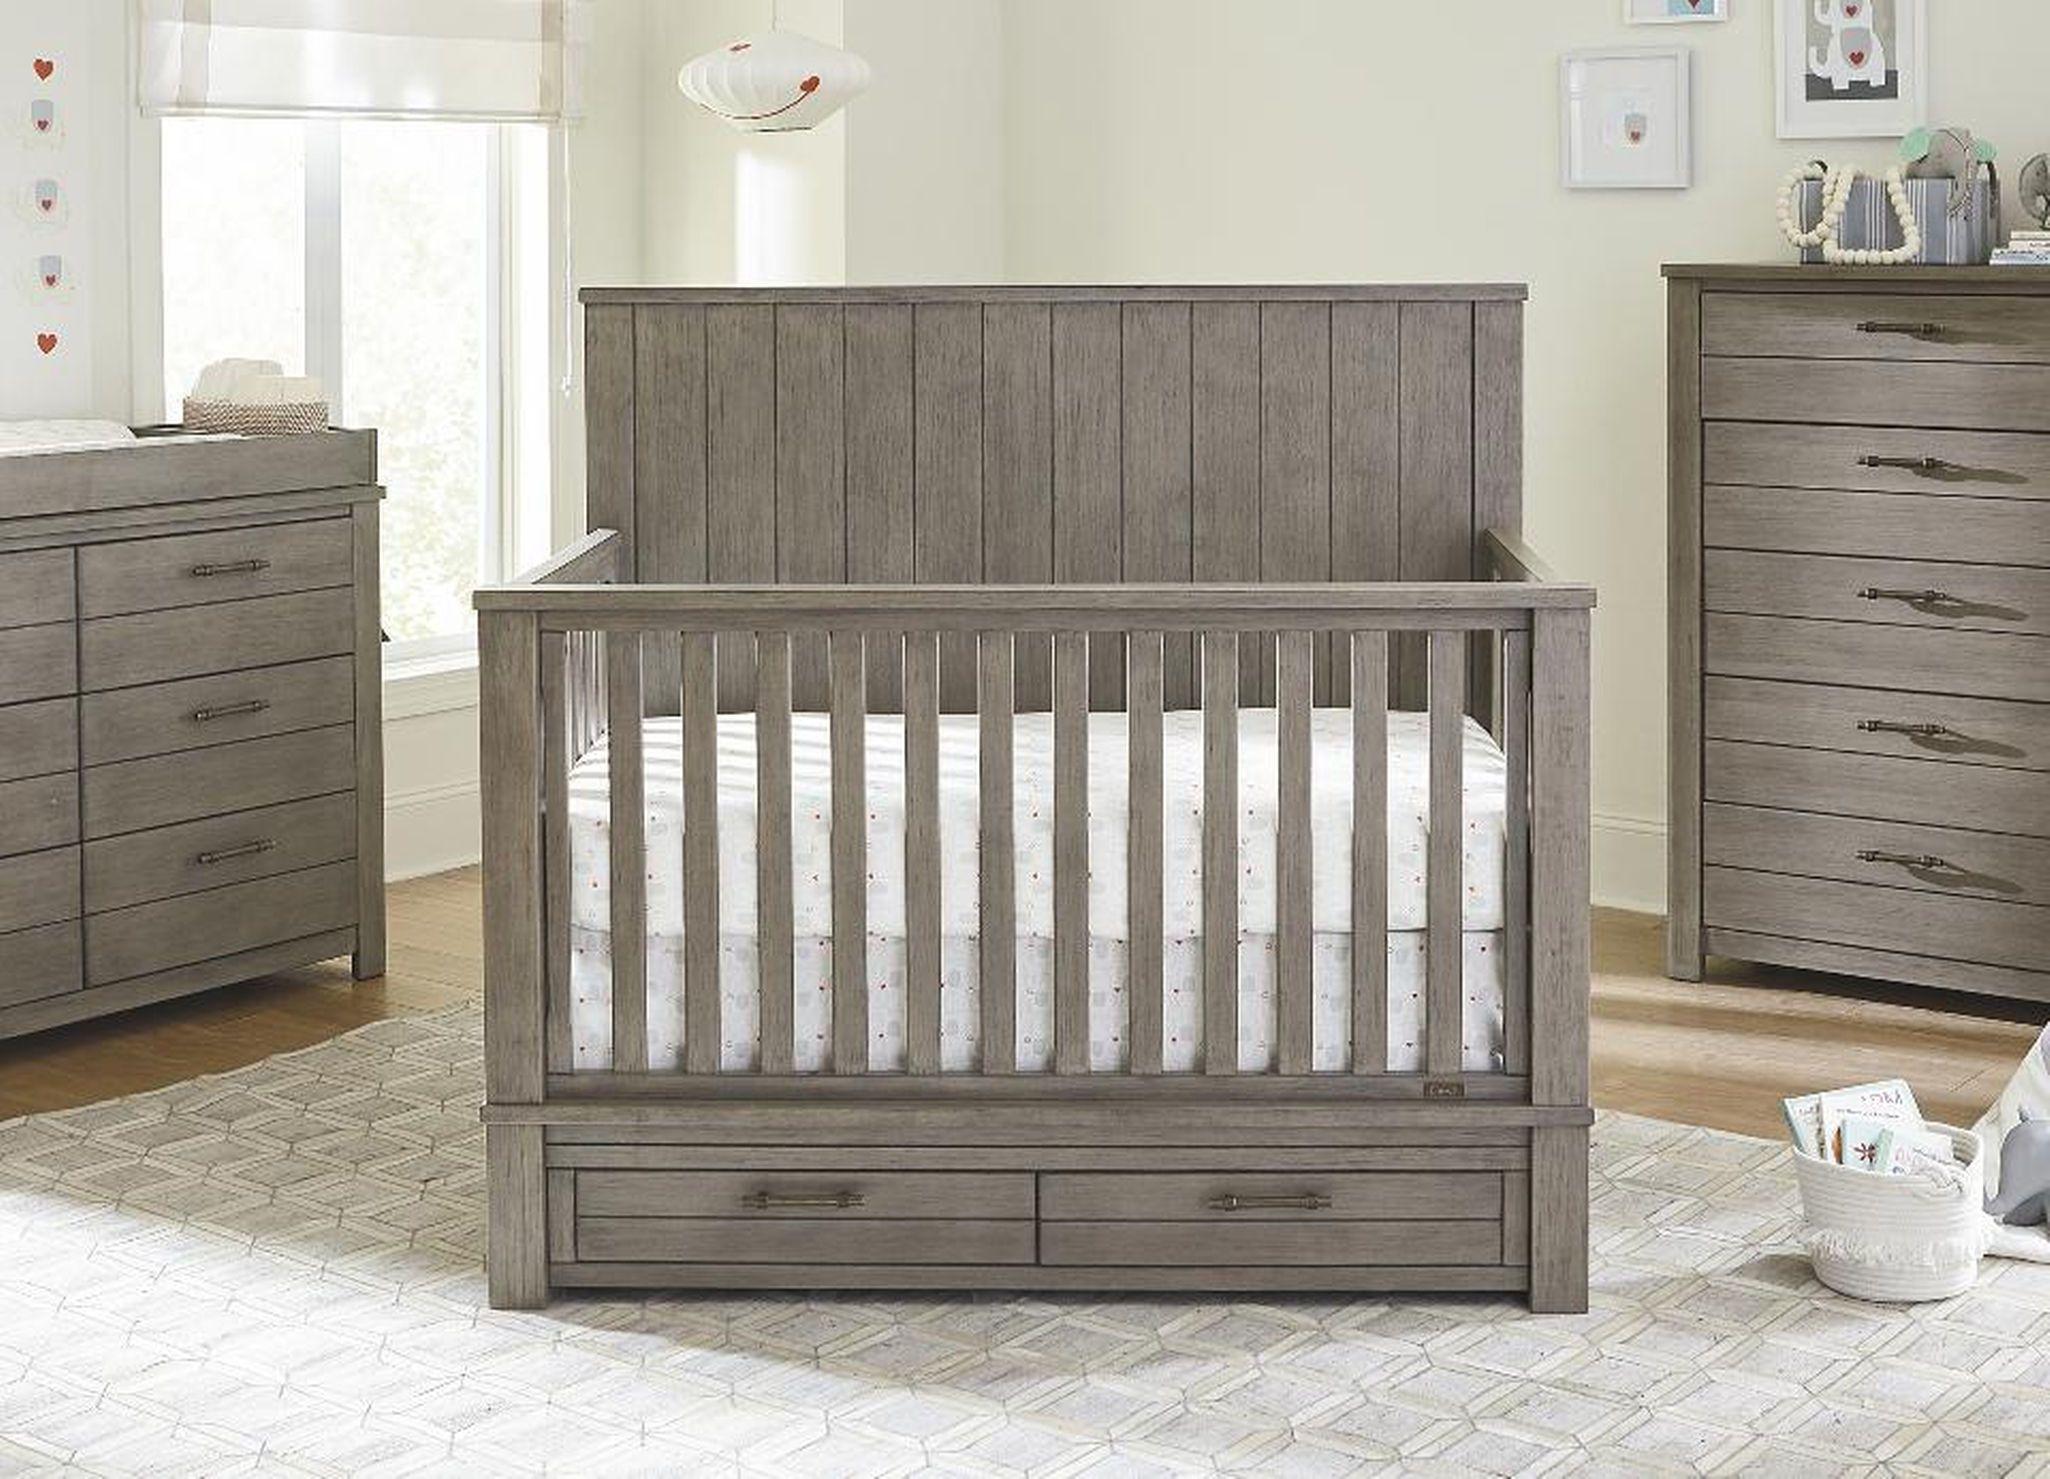 Bassett Dreams Everest 4 In 1 Convertible Storage Crib Smokey Grey Cribs Convertible Crib Baby Nursery Furniture Sets [ 1479 x 2050 Pixel ]